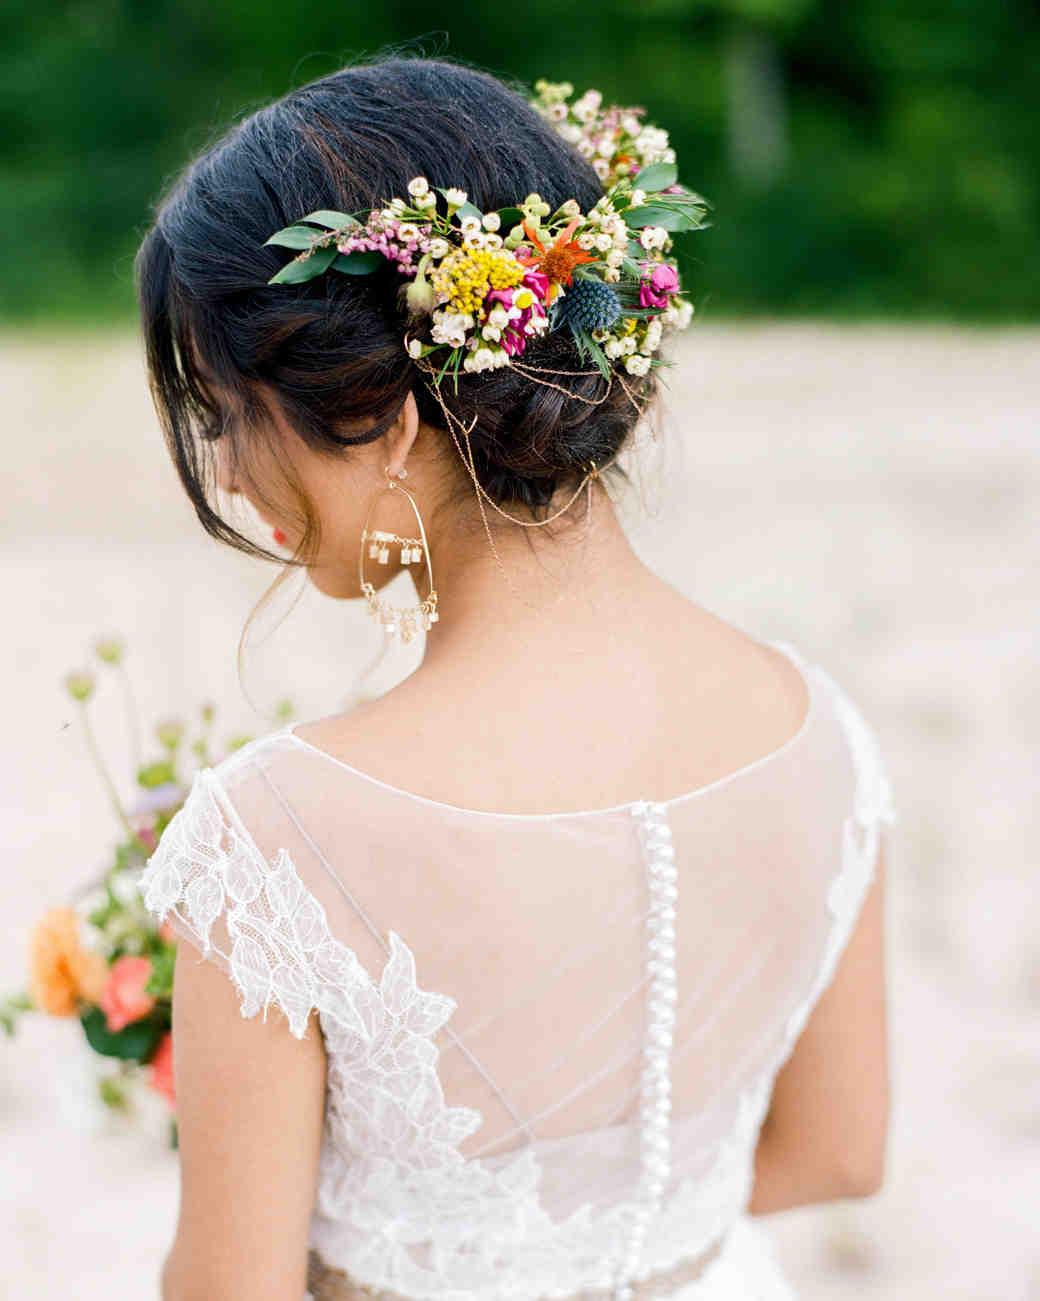 Wedding Bridal Hairstyles  13 Braided Wedding Hairstyles We Love